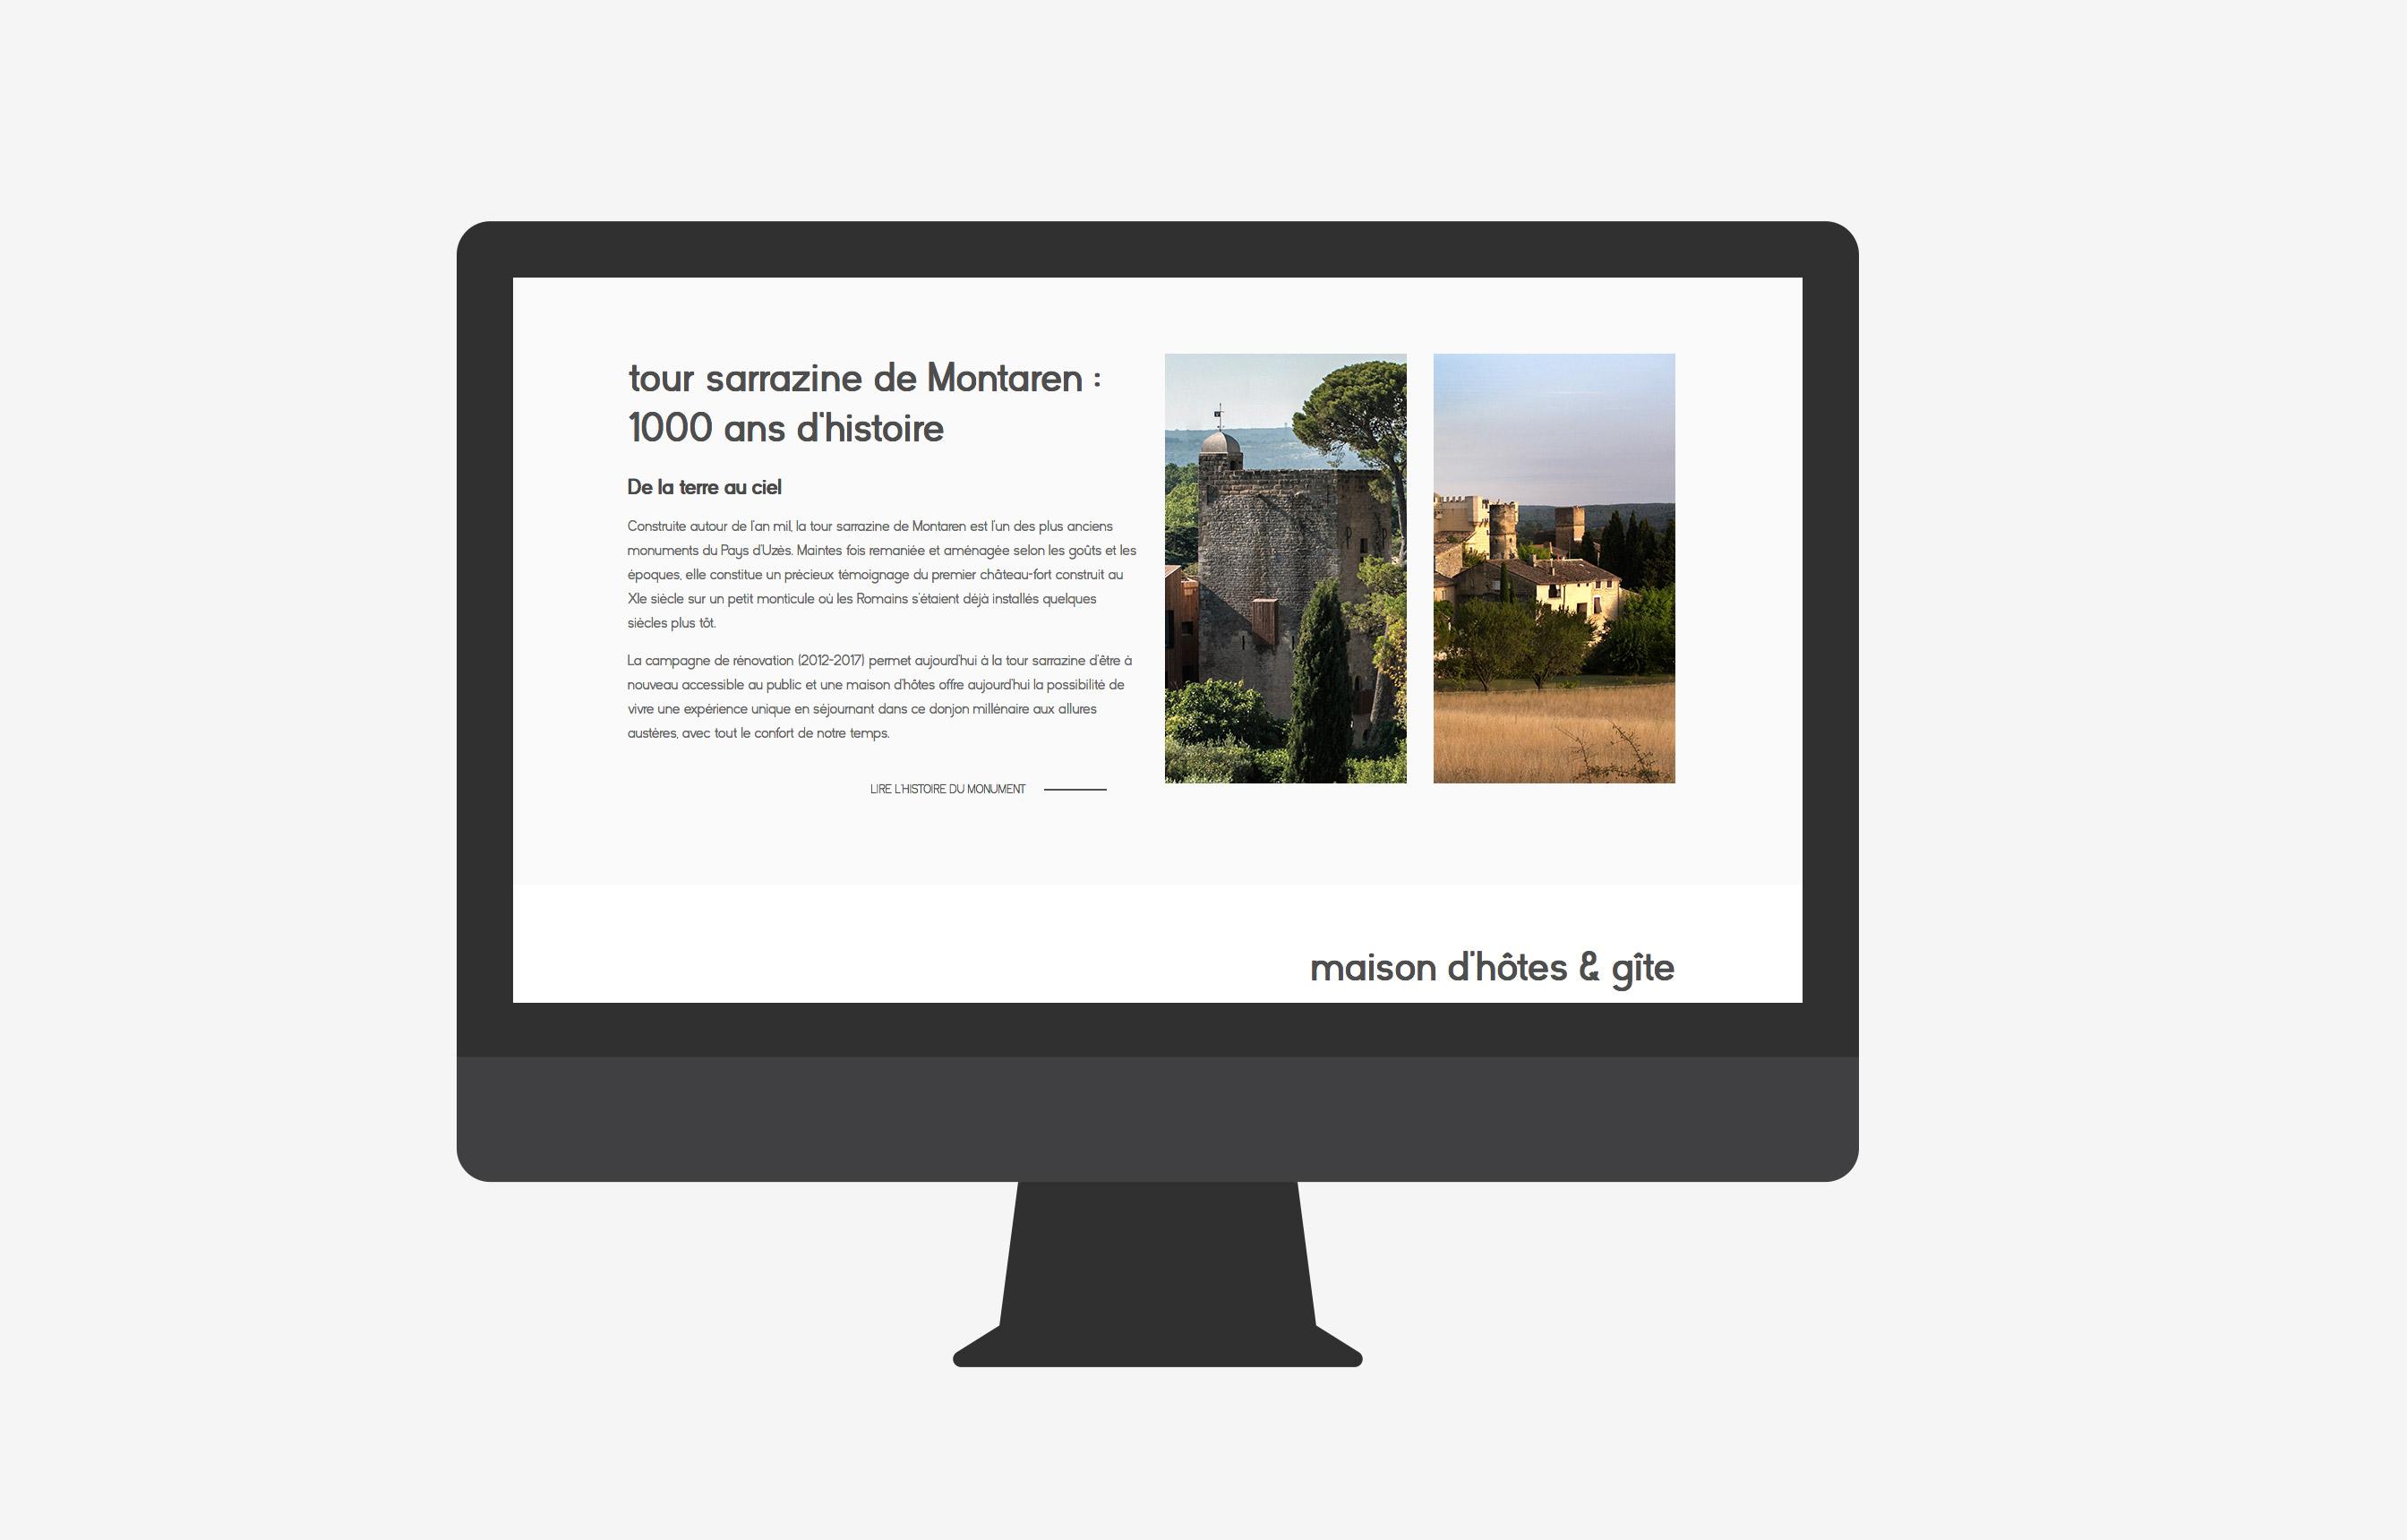 03-tour-sarrazine-pikteo-webdesign-graphic-design-freelance-paris-bruxelles-londres